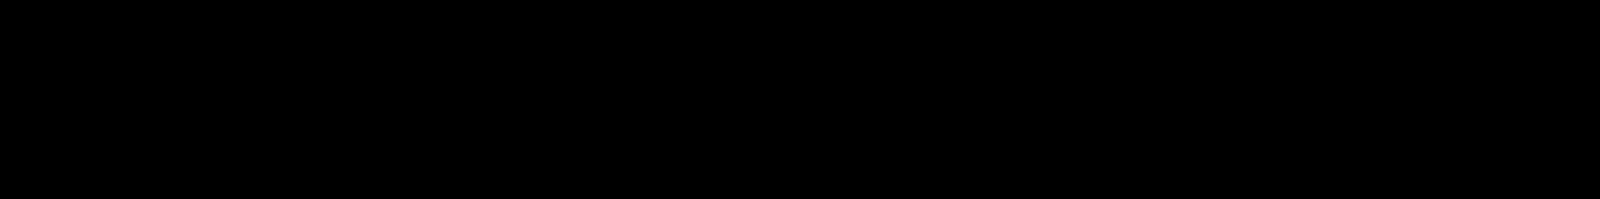 Hydrogen | Chemistry Notes for IITJEE/NEET